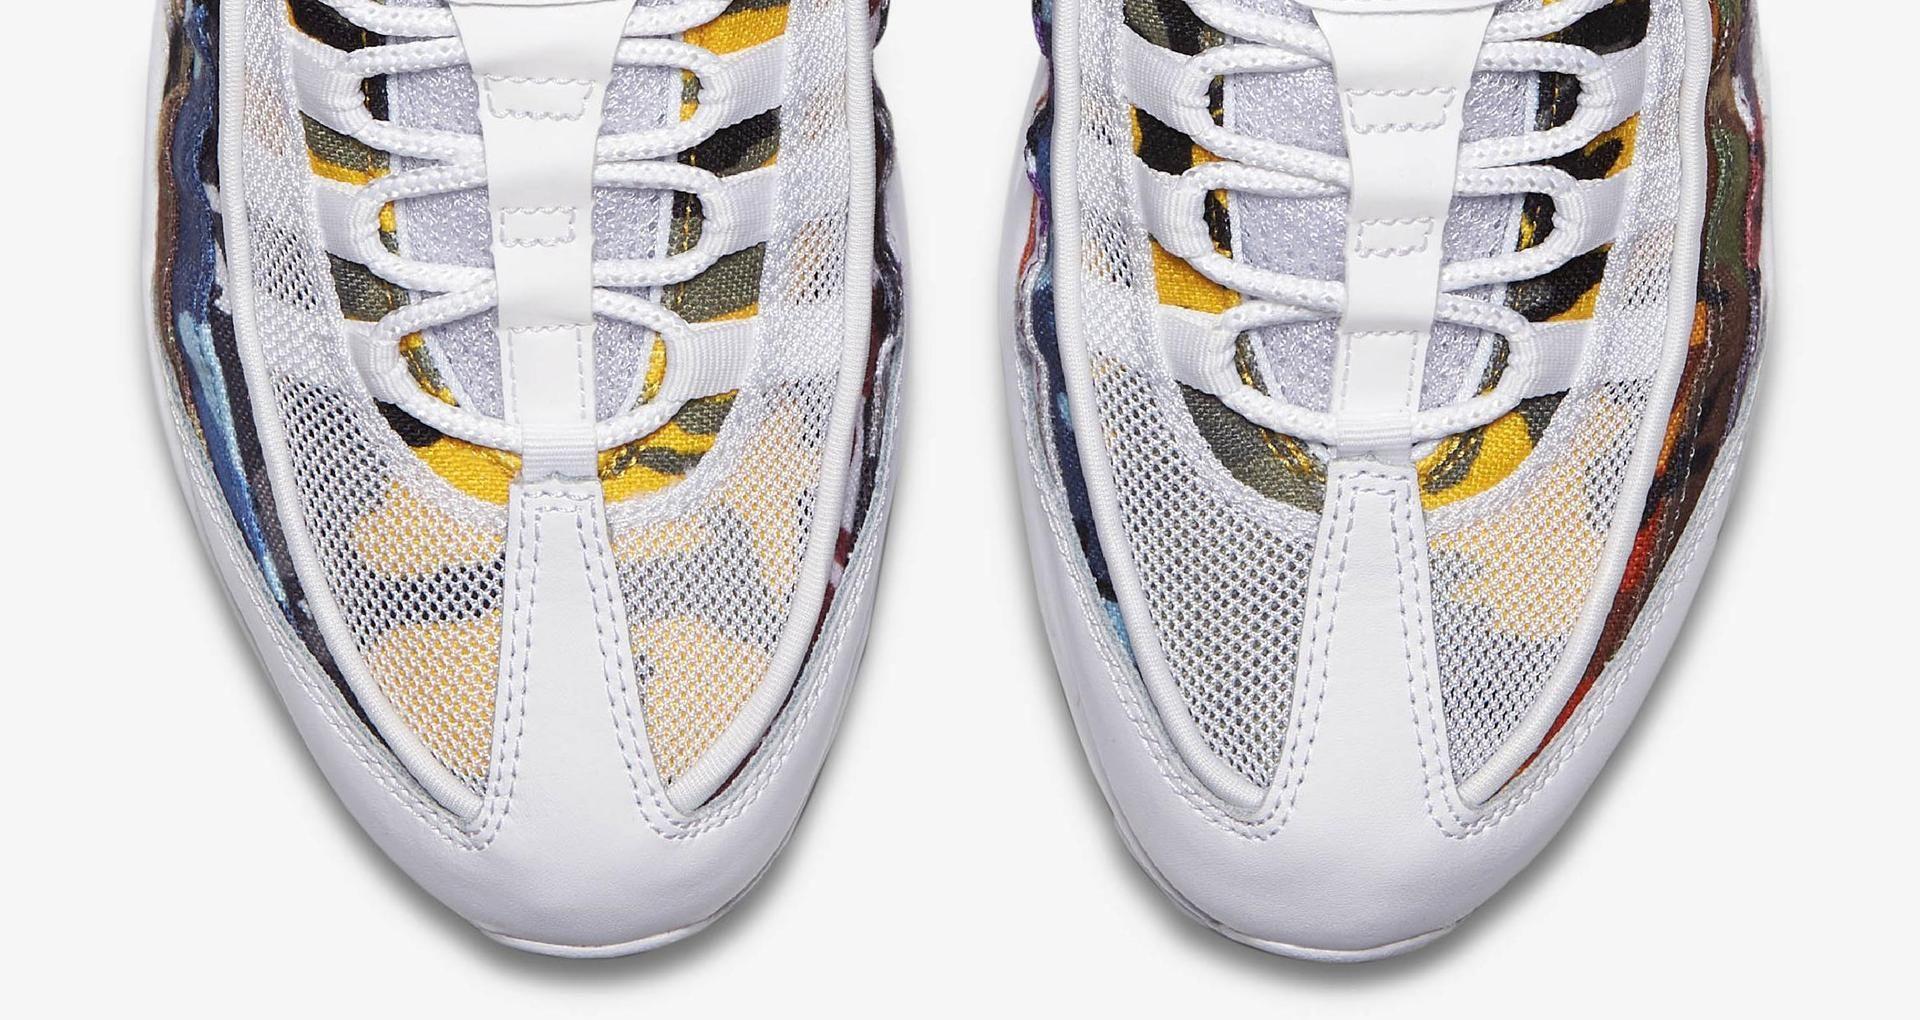 Nike Air Max 95 OG MC SP 'White & Multi Colour' Release